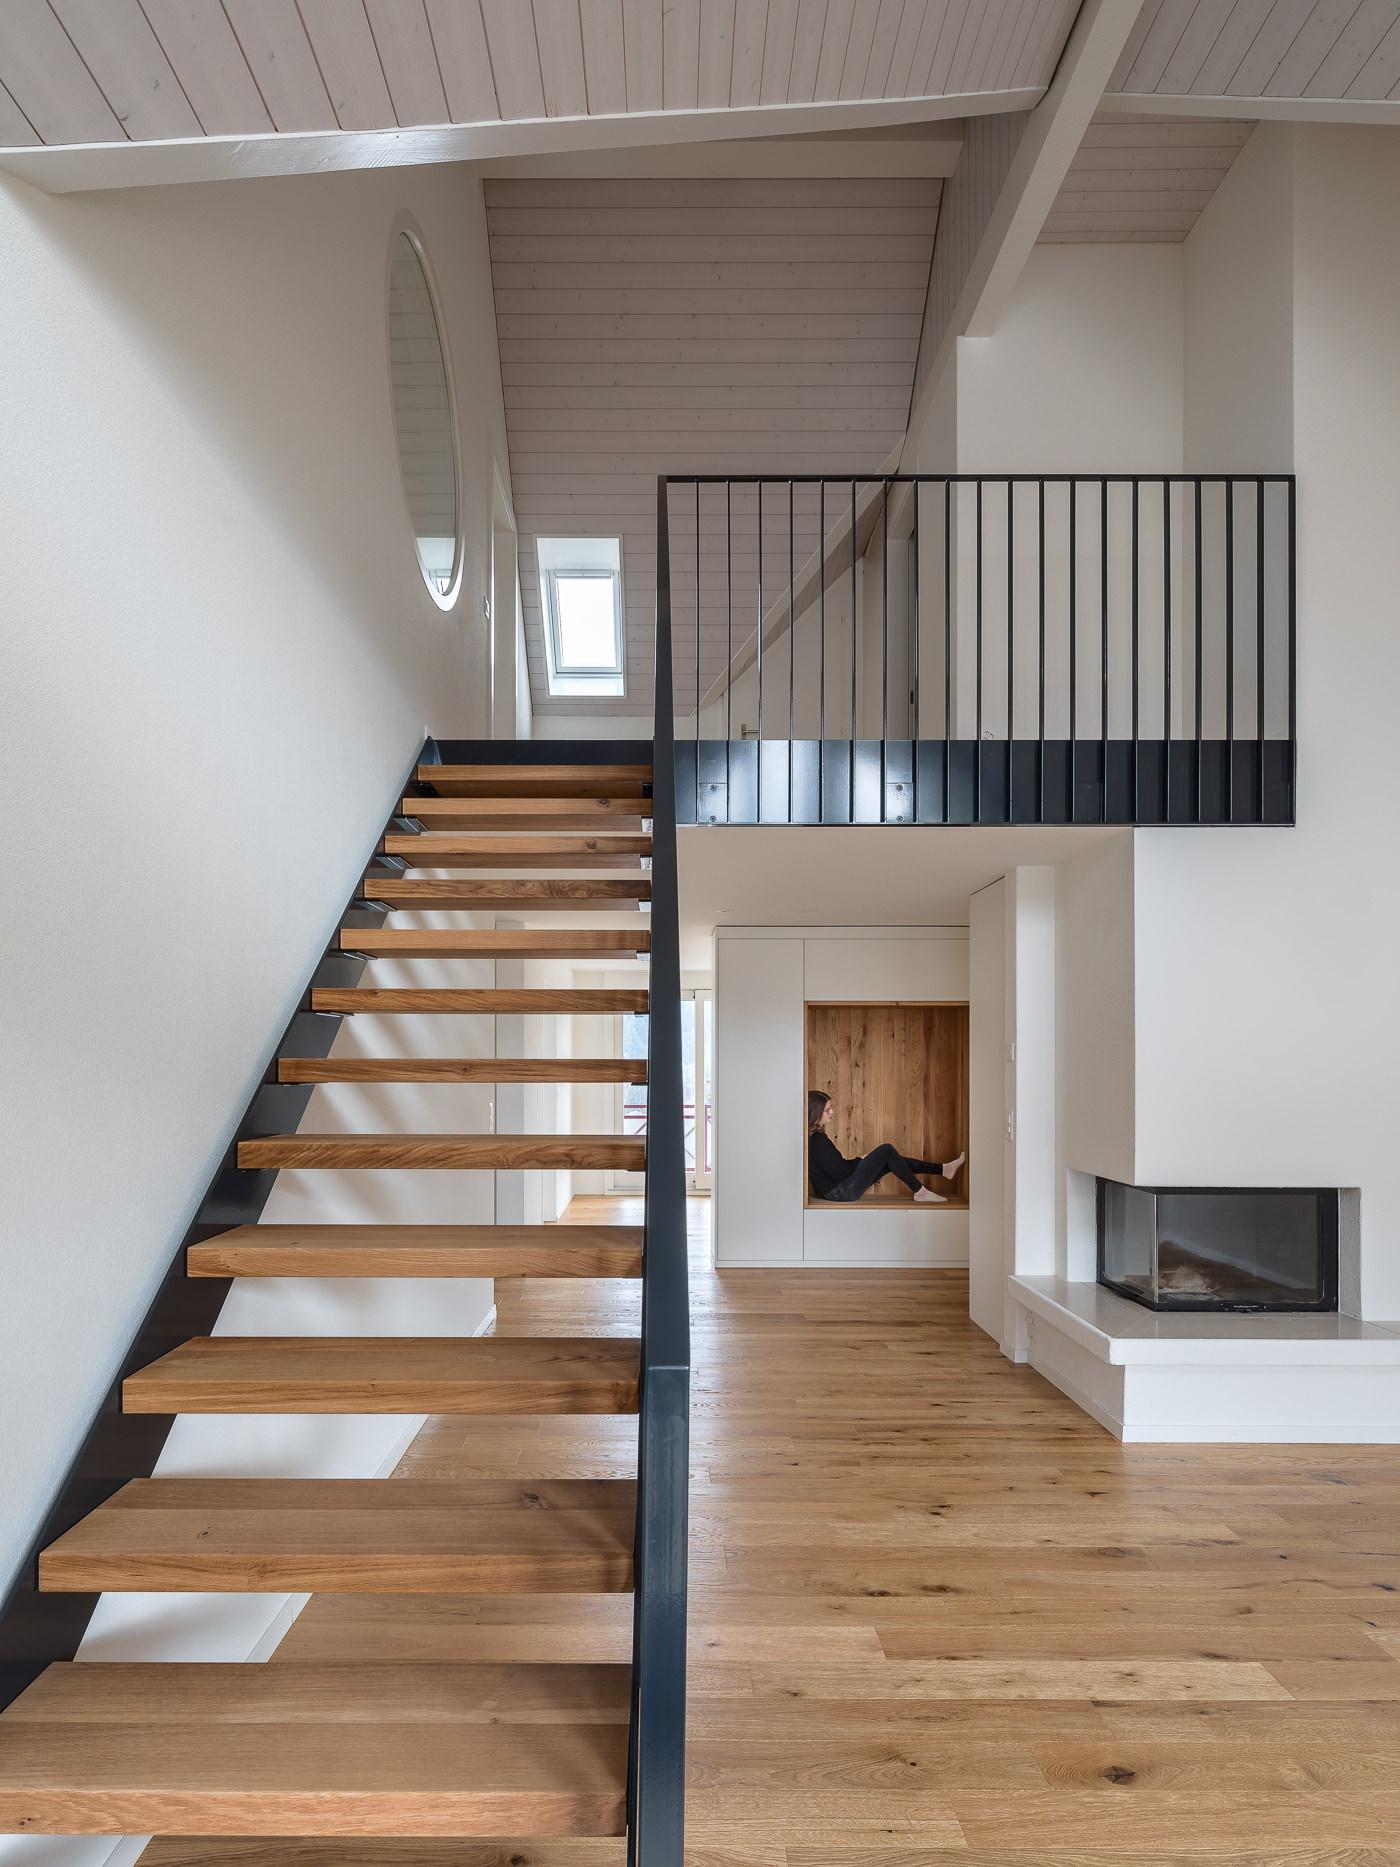 buan architekten – Umbau Attikawohnung Willisau – Foto – Treppe